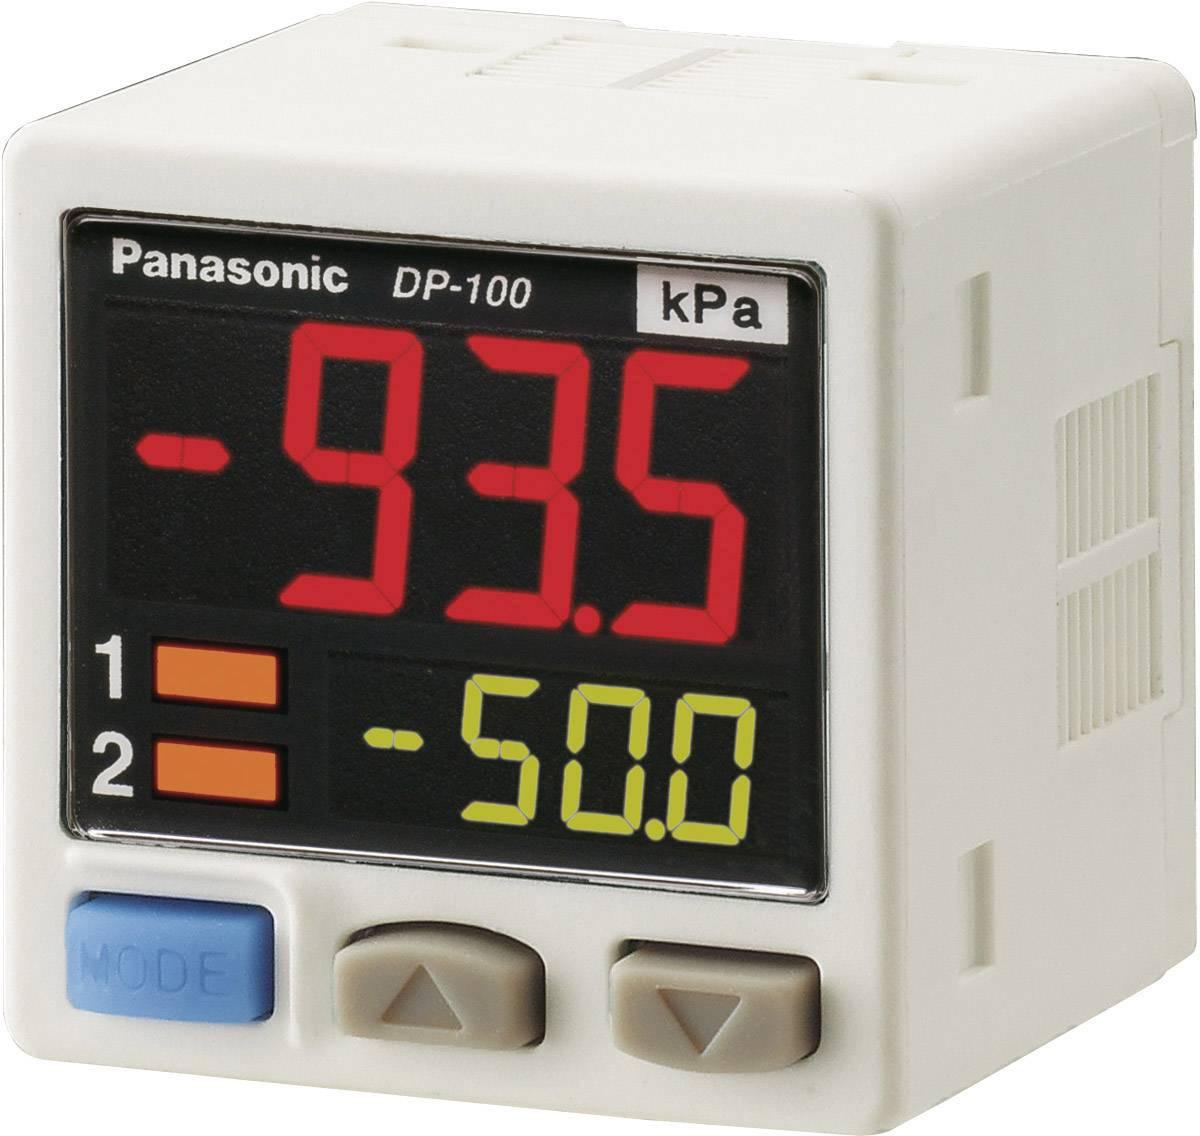 USED Panasonic DP-100 DP-101